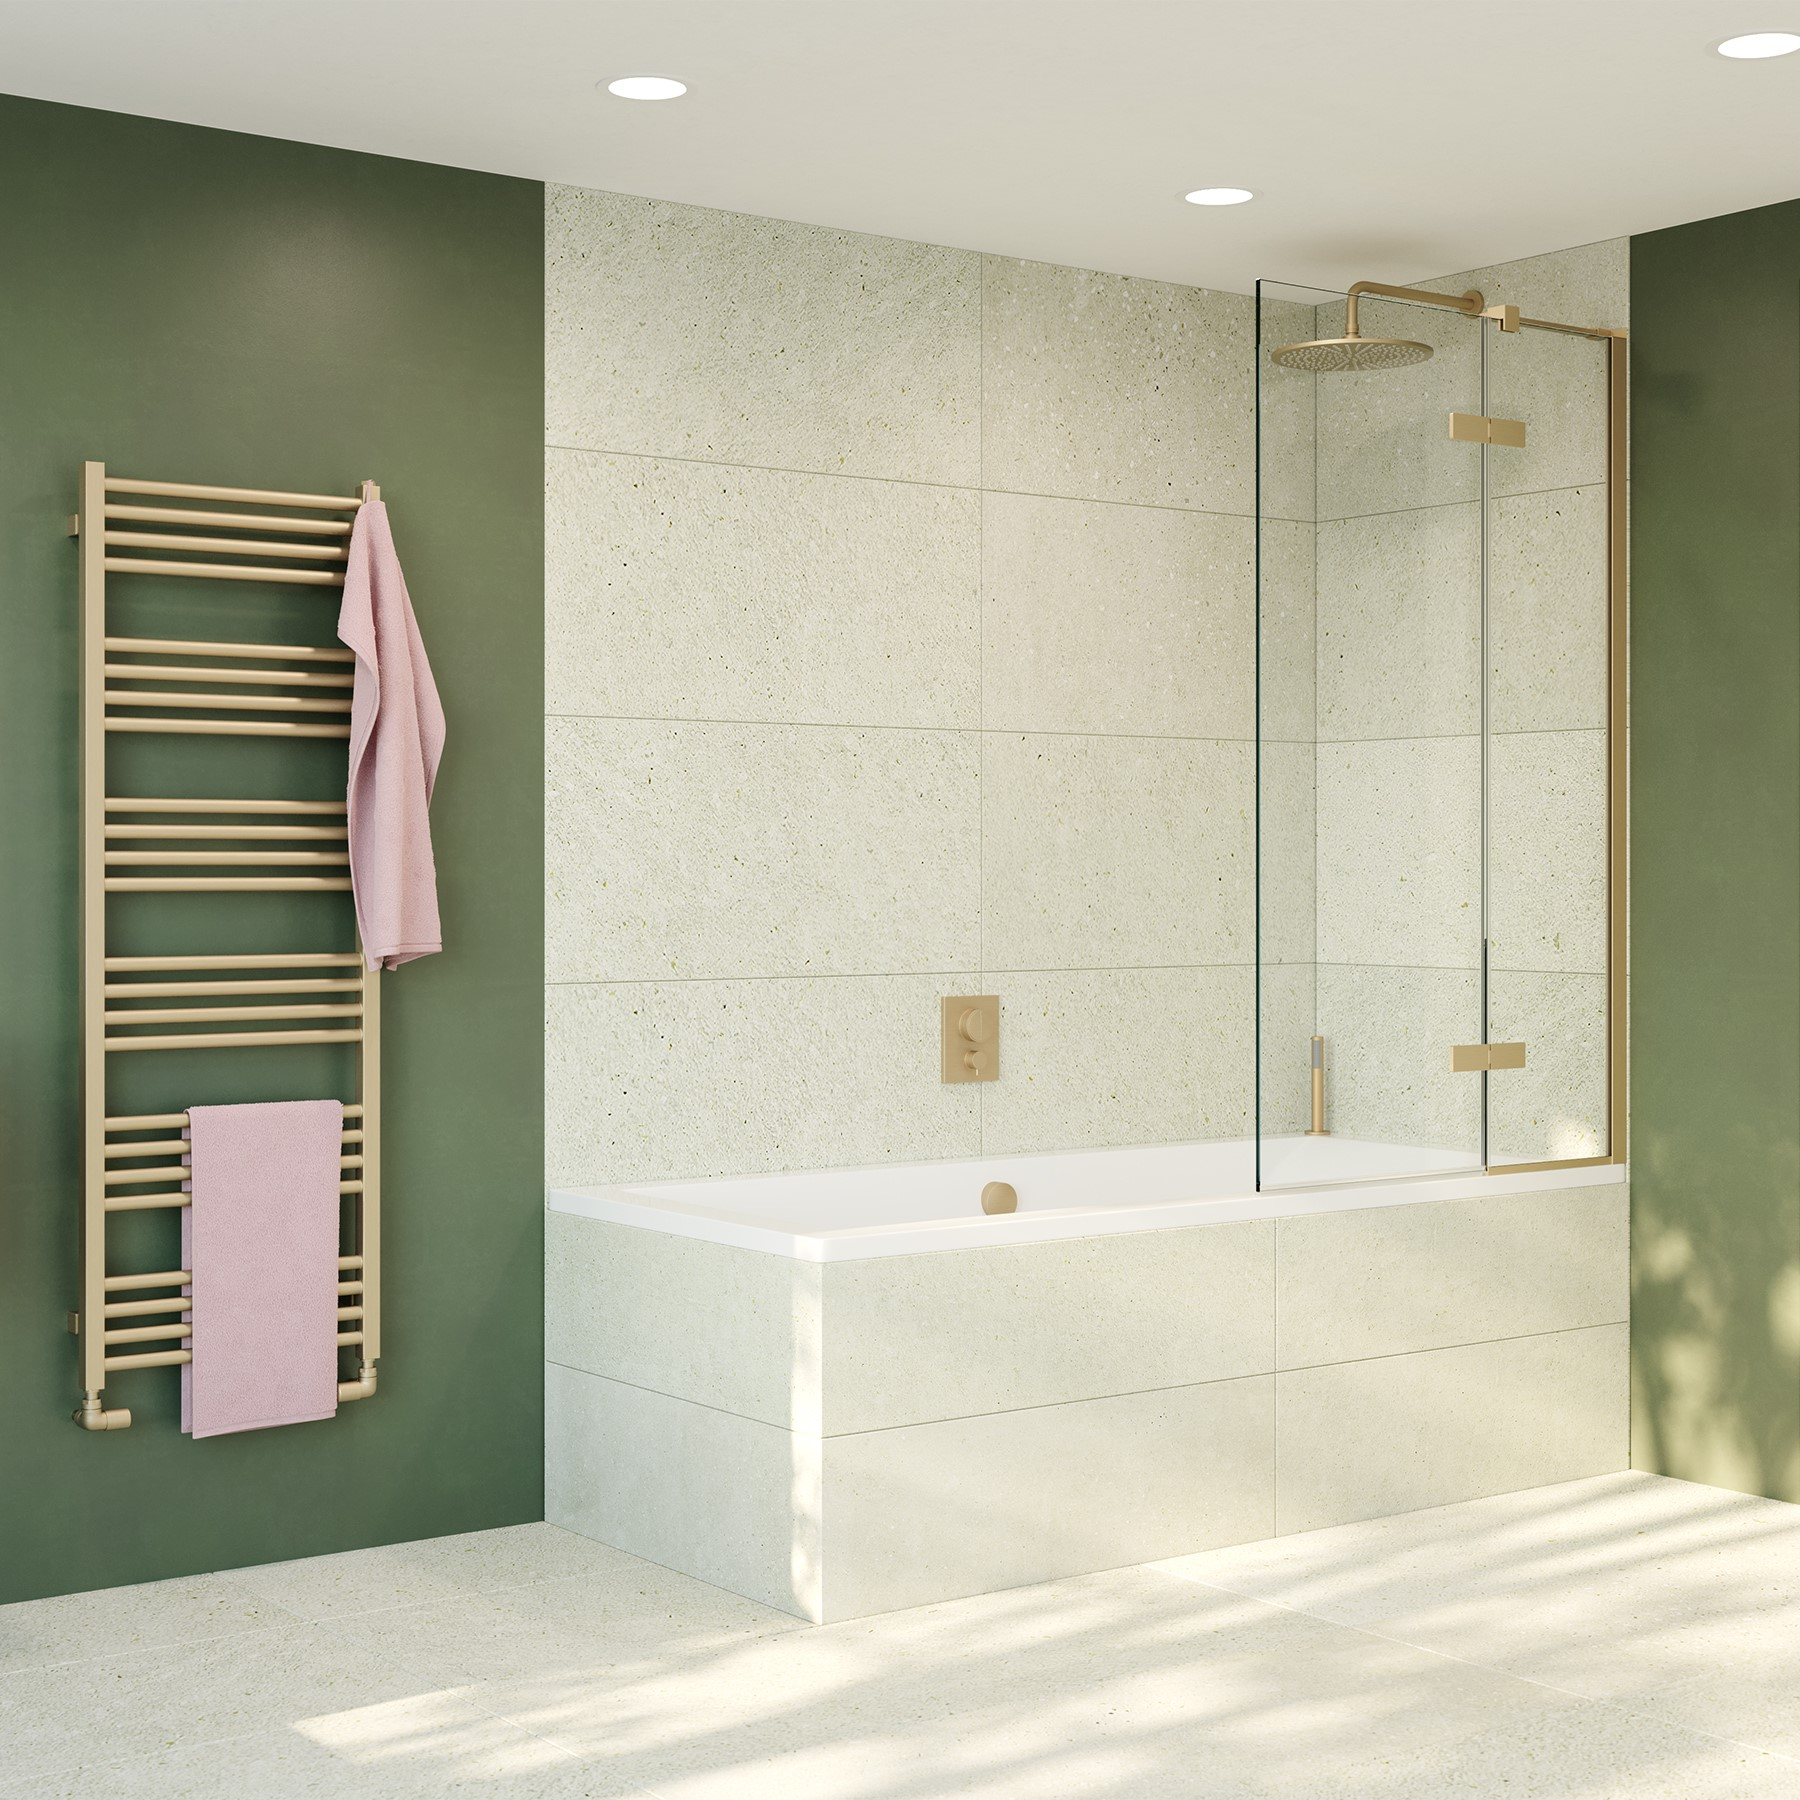 Optix 10 Brushed Brass Bath Screen